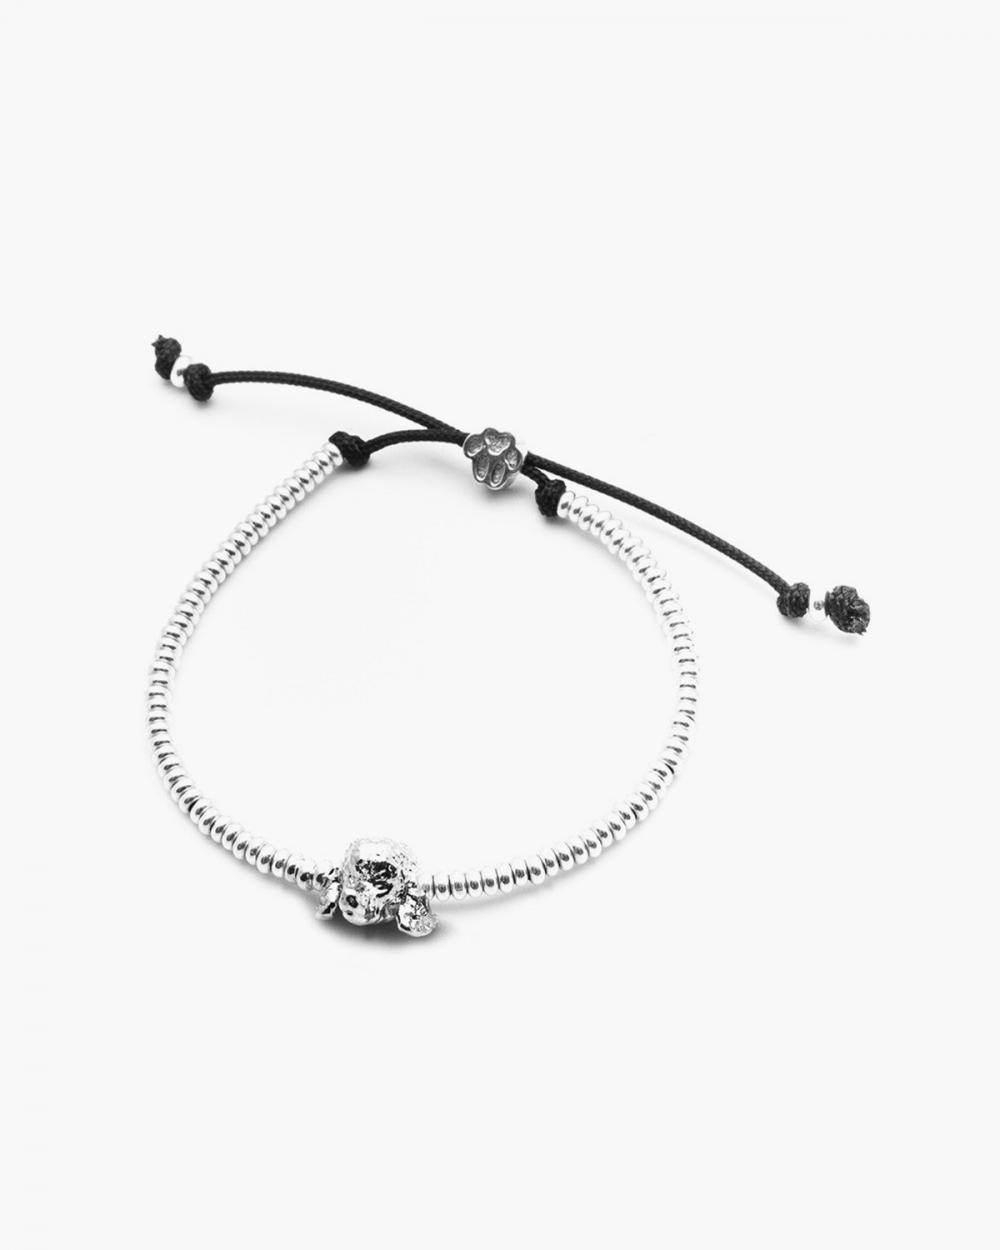 Bracelets POODLE SNOUT BRACELET / POLISHED SILVER NOVE25